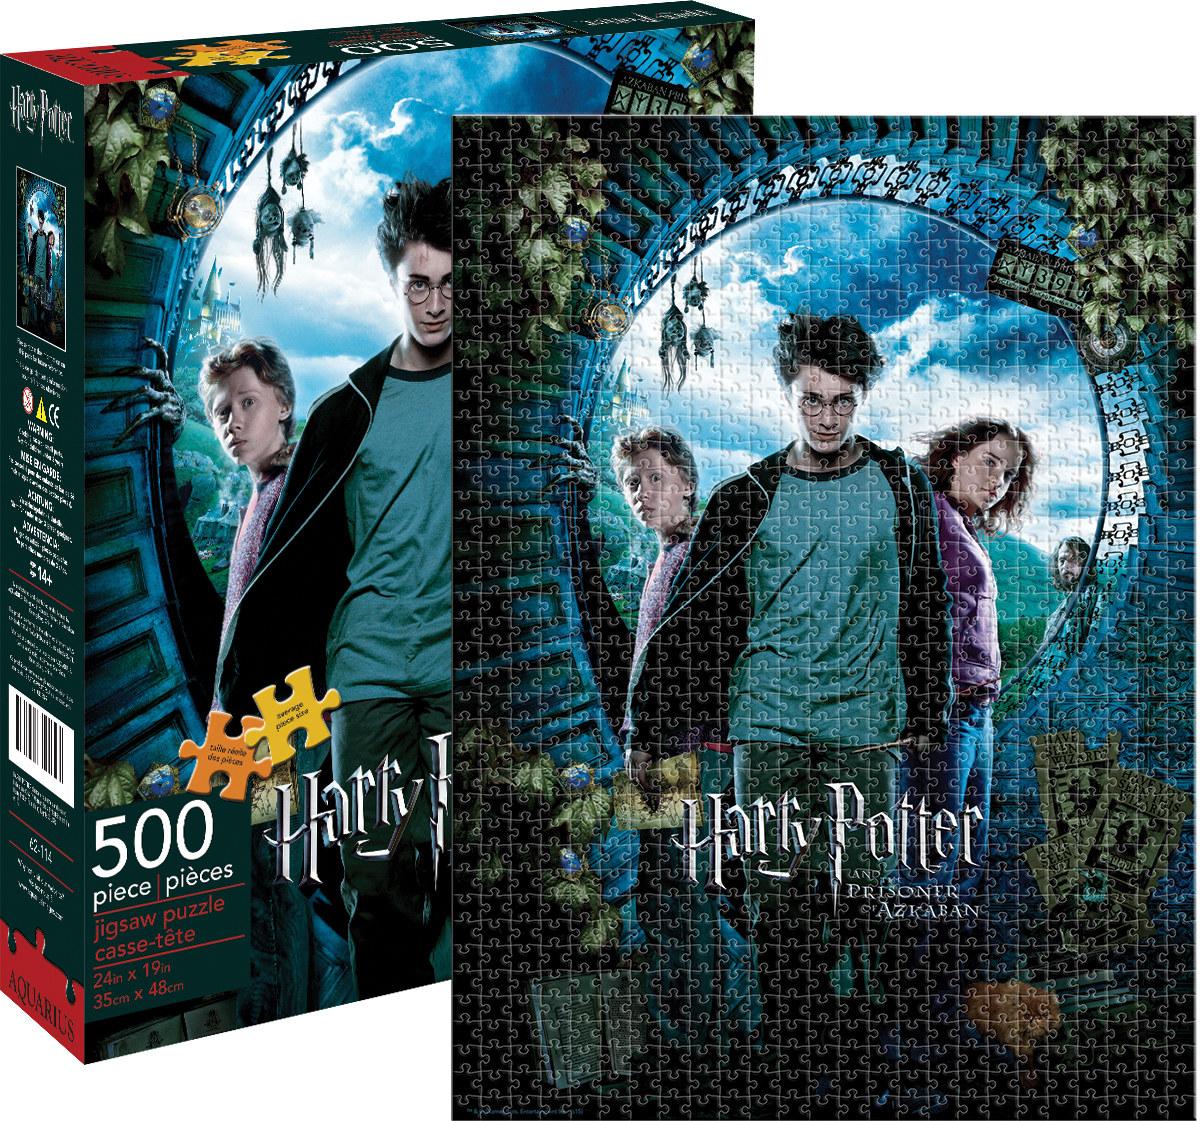 Harry Potter Prisoner of Azkaban Fantasy Jigsaw Puzzle